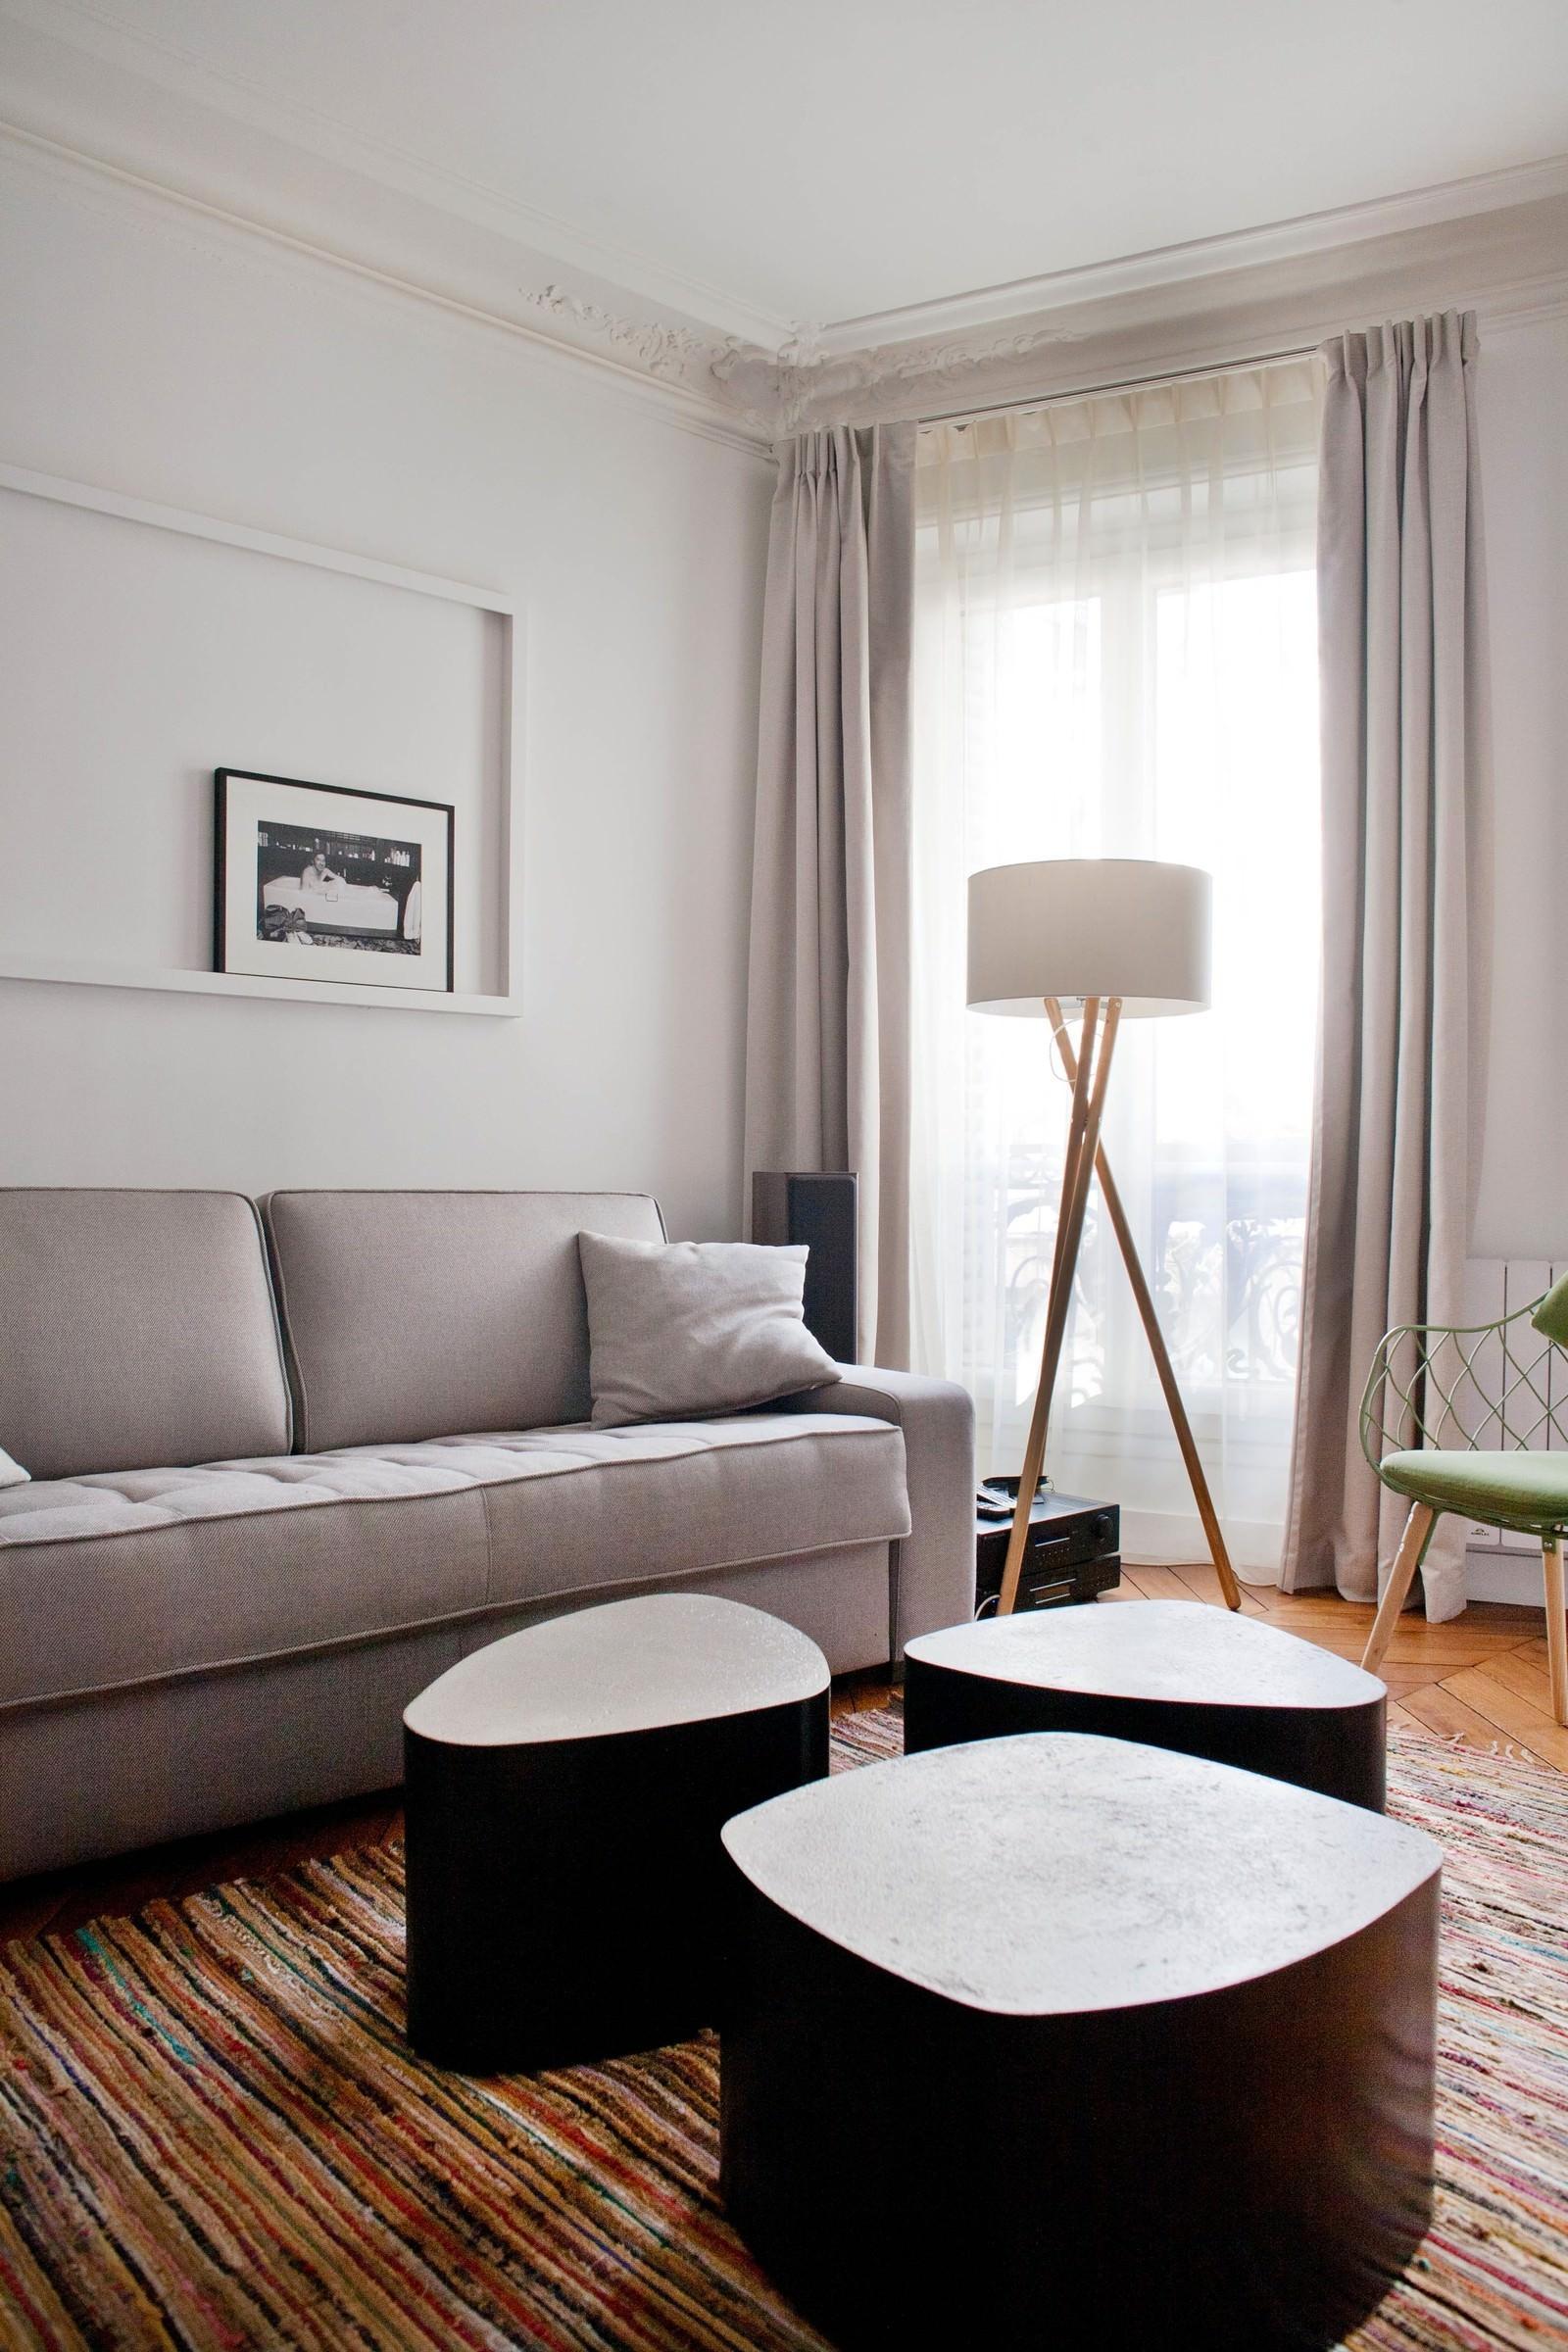 proektat-za-malak-semeen-apartament-v-parij-5g